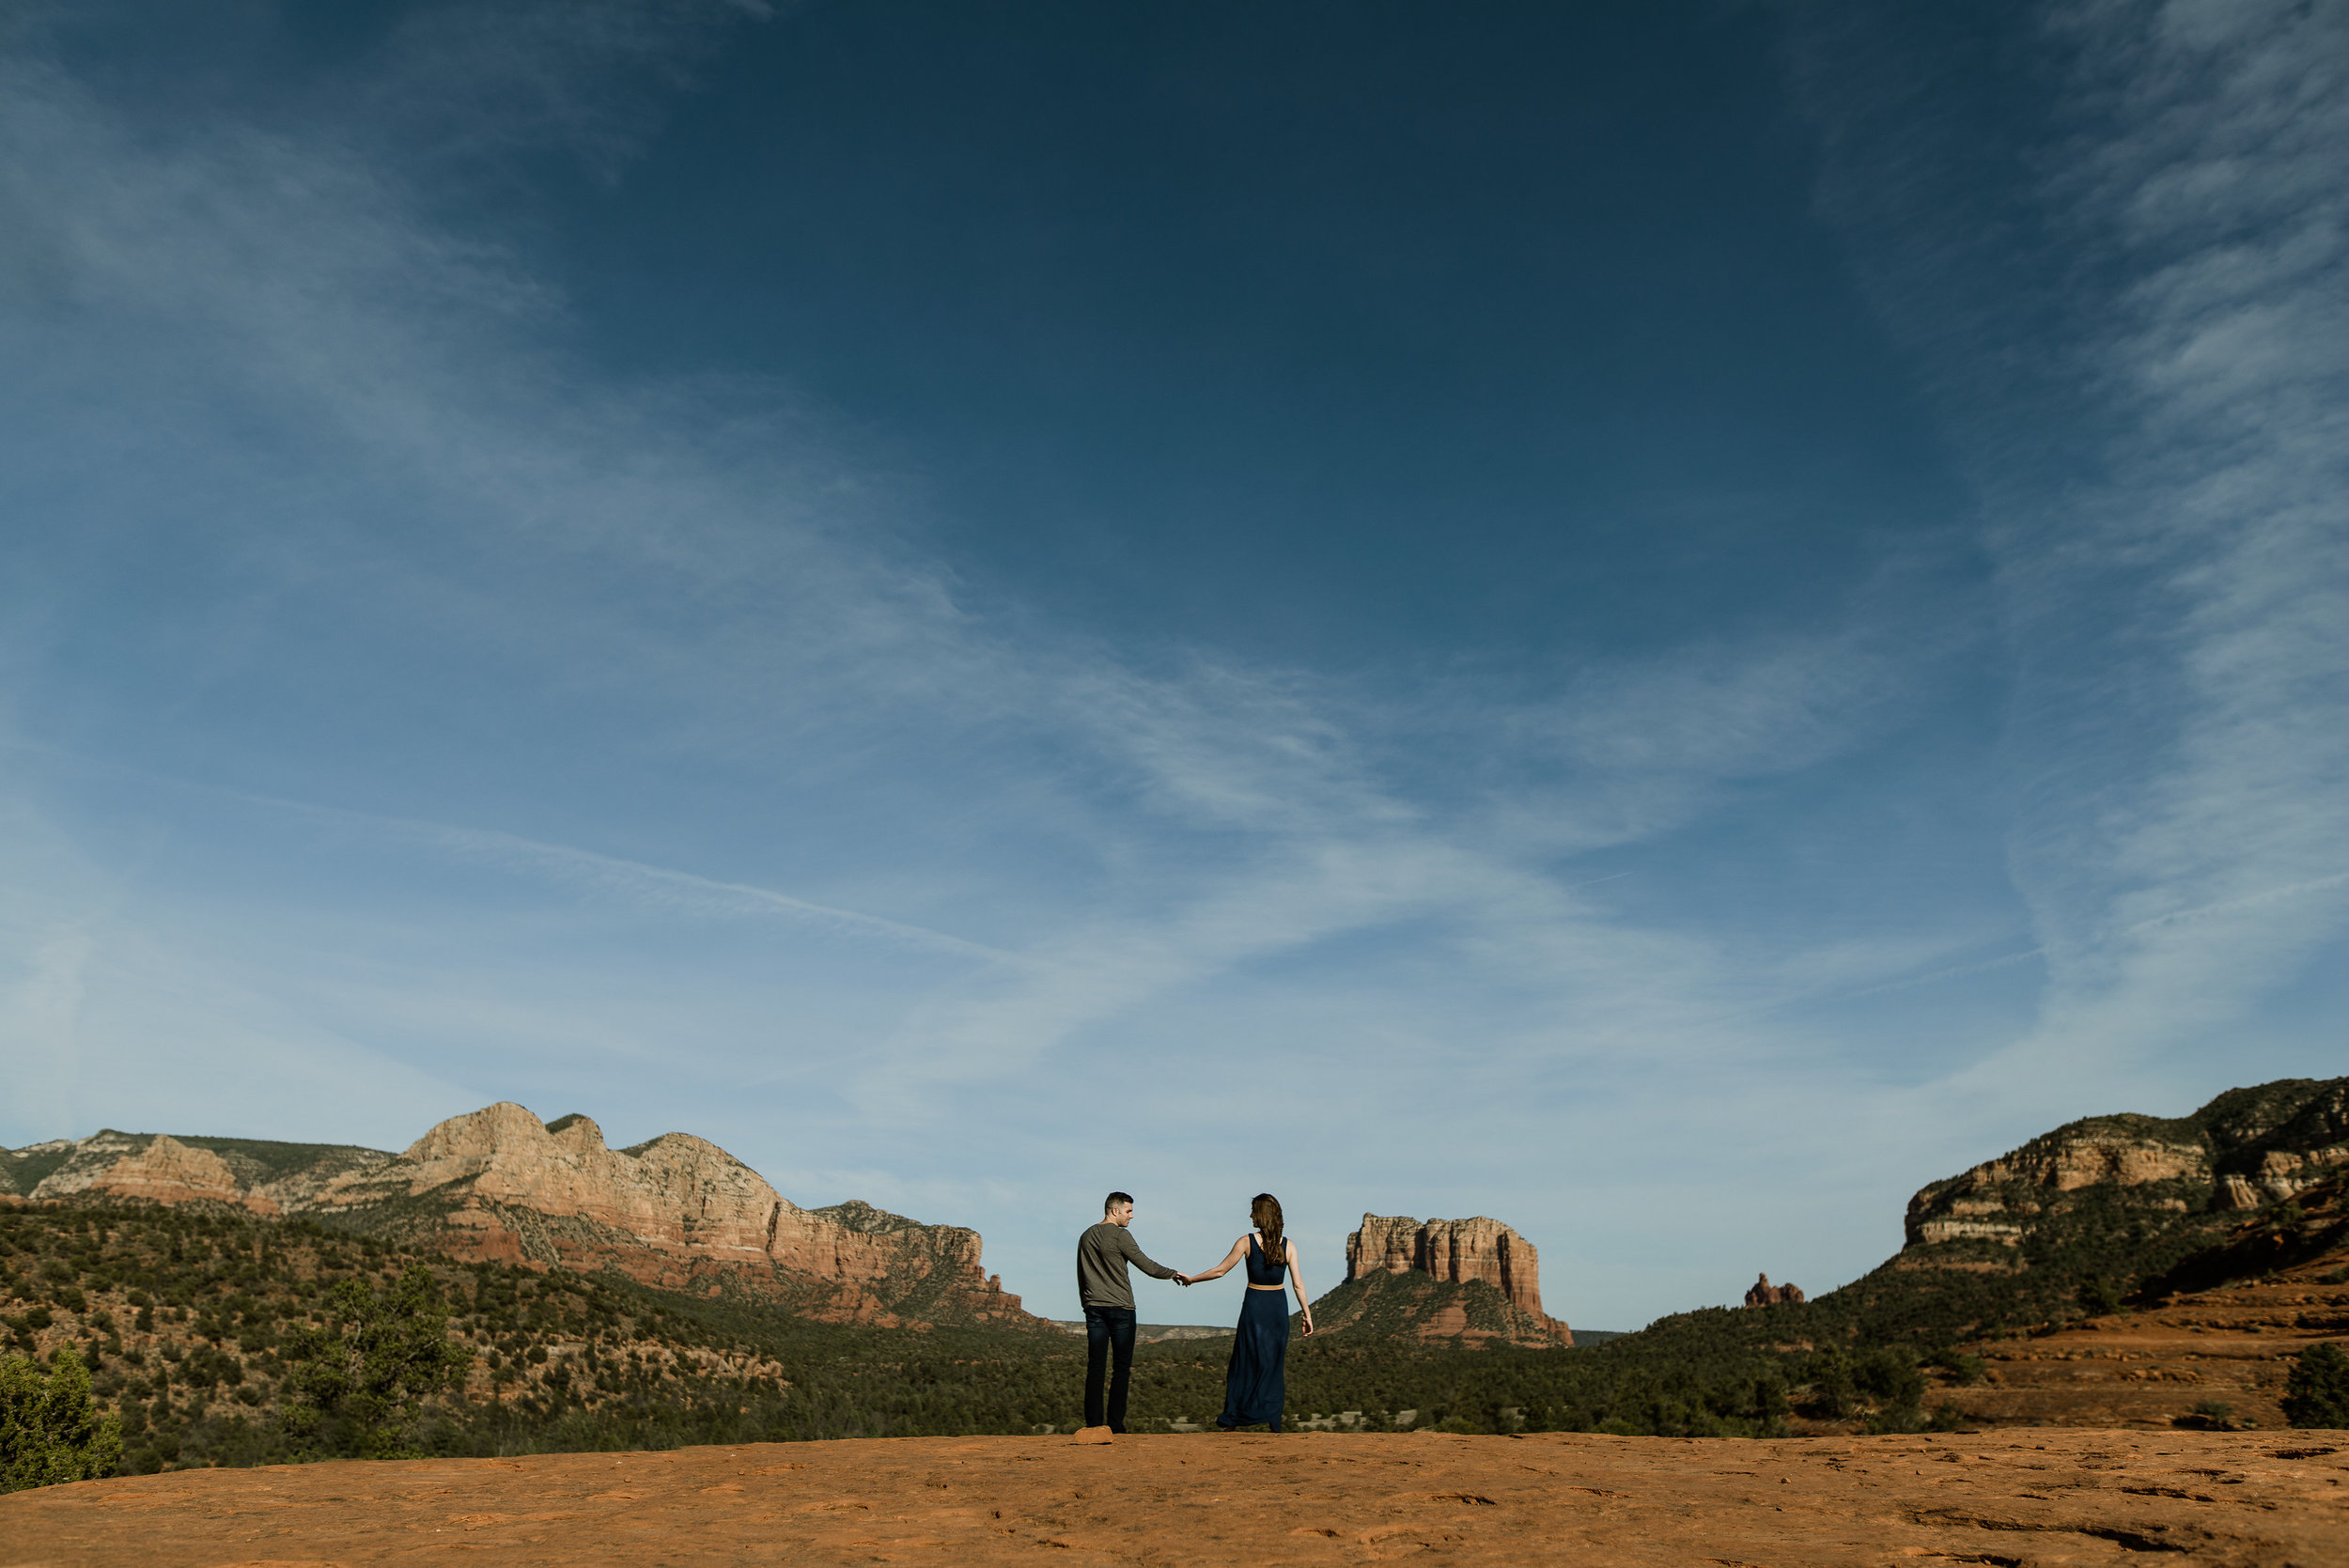 Isaiah-&-Taylor-Photography---Paul-&-Karen-Engagement,-Sedona-Arizona-011.jpg